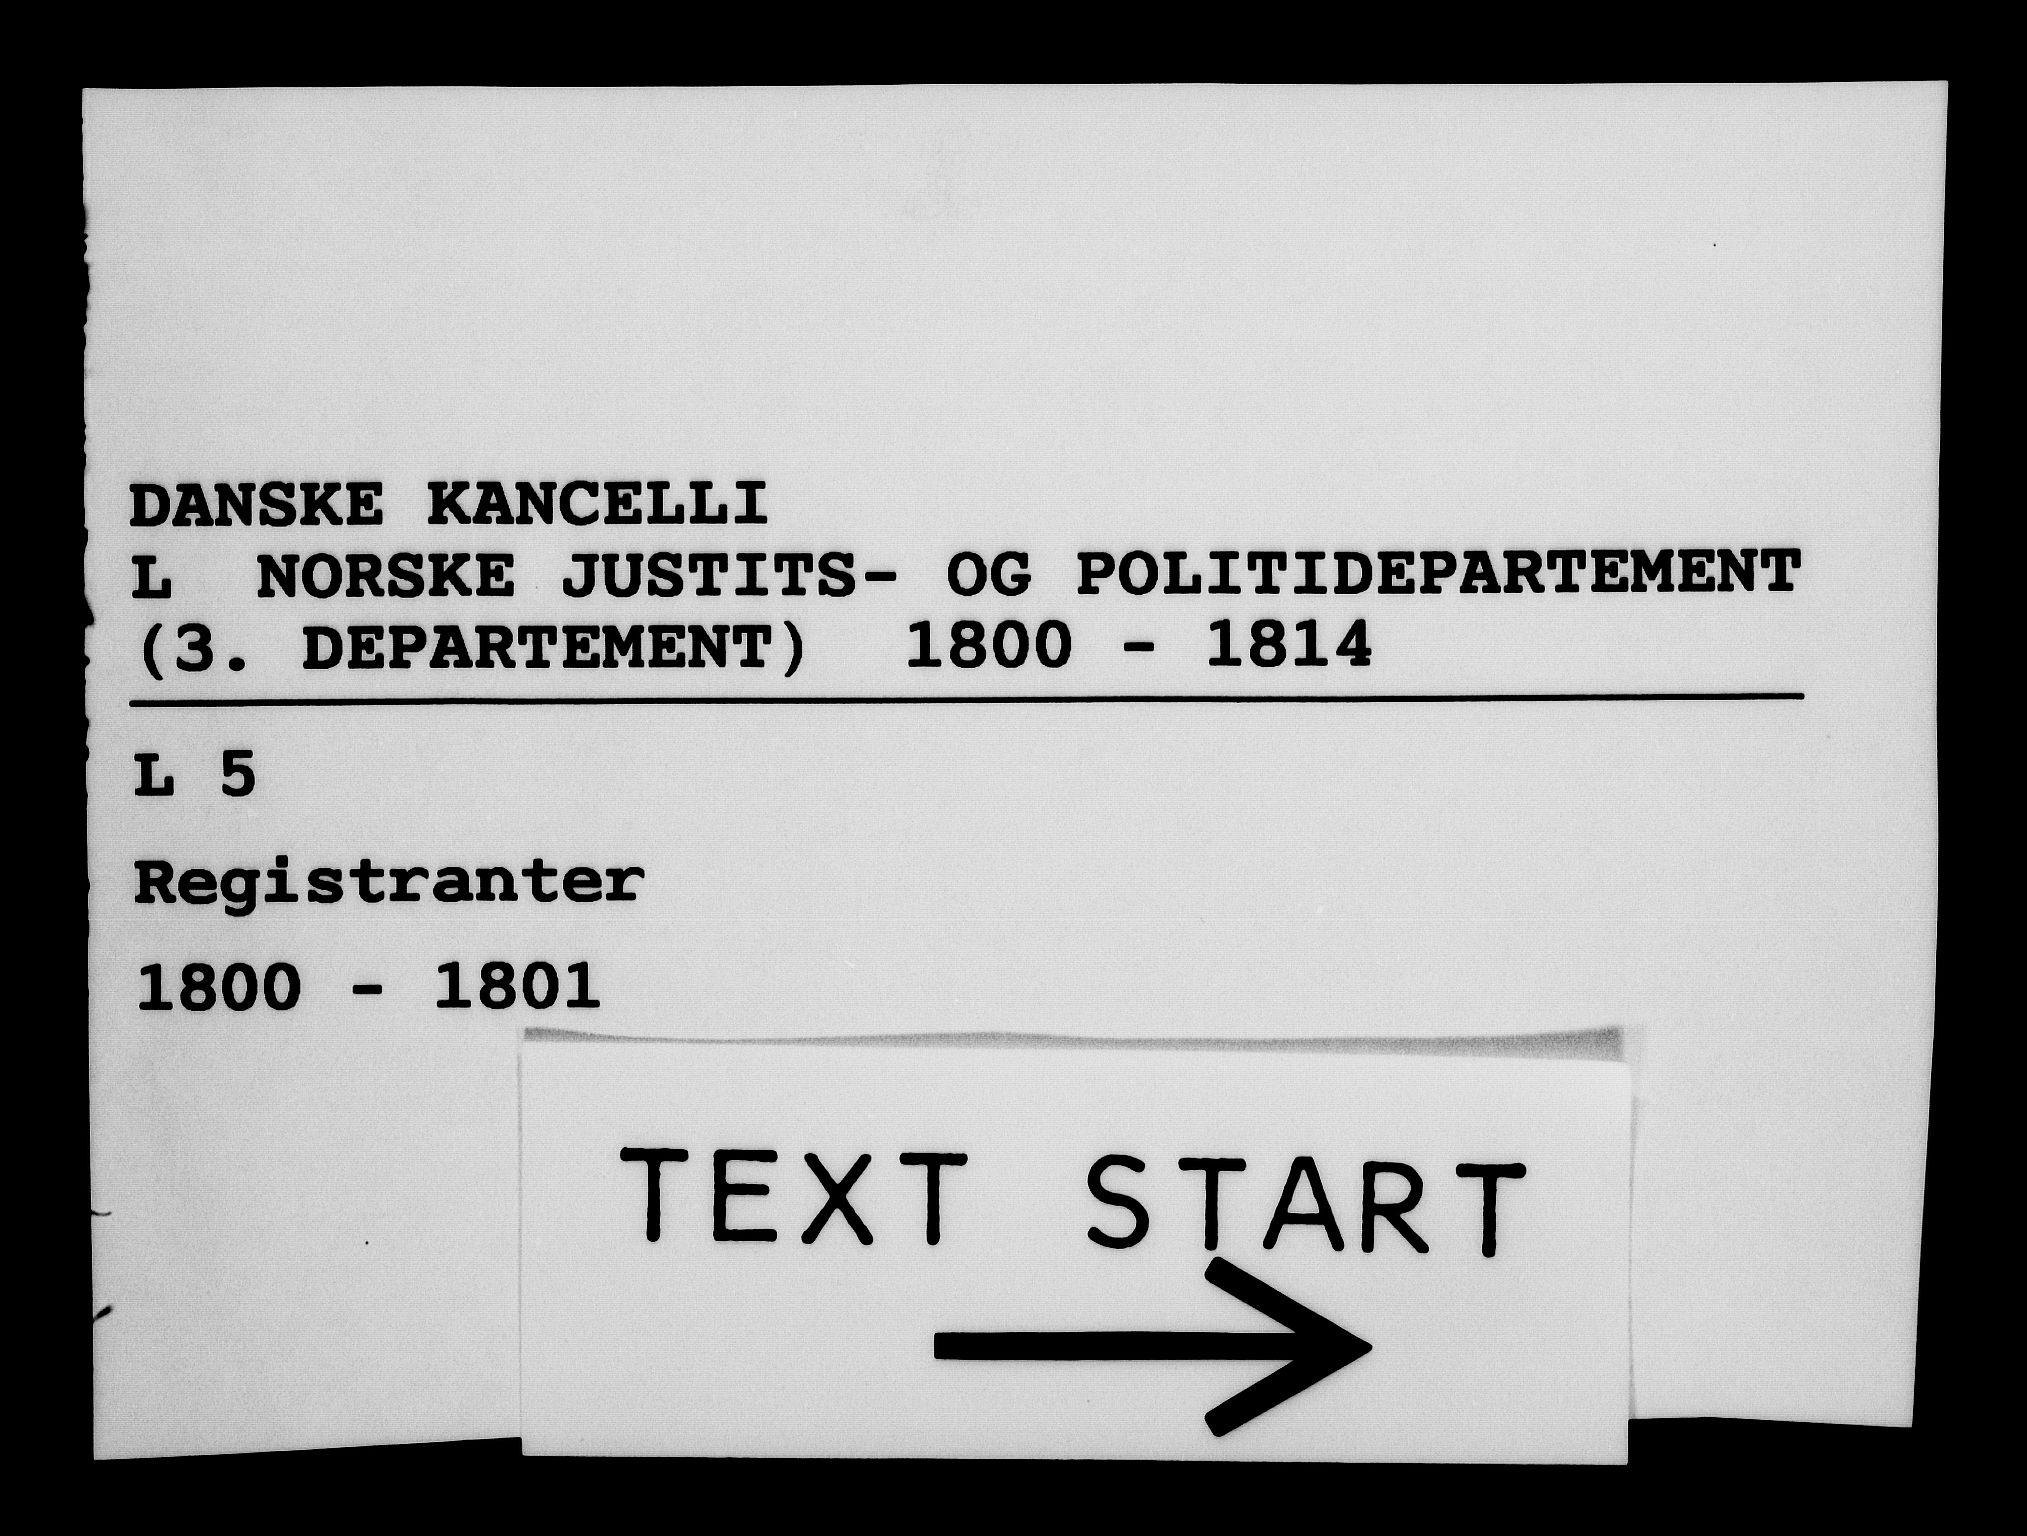 RA, Danske Kanselli 1800-1814, H/Hf/Hfb/Hfba/L0001: Registranter, 1800-1801